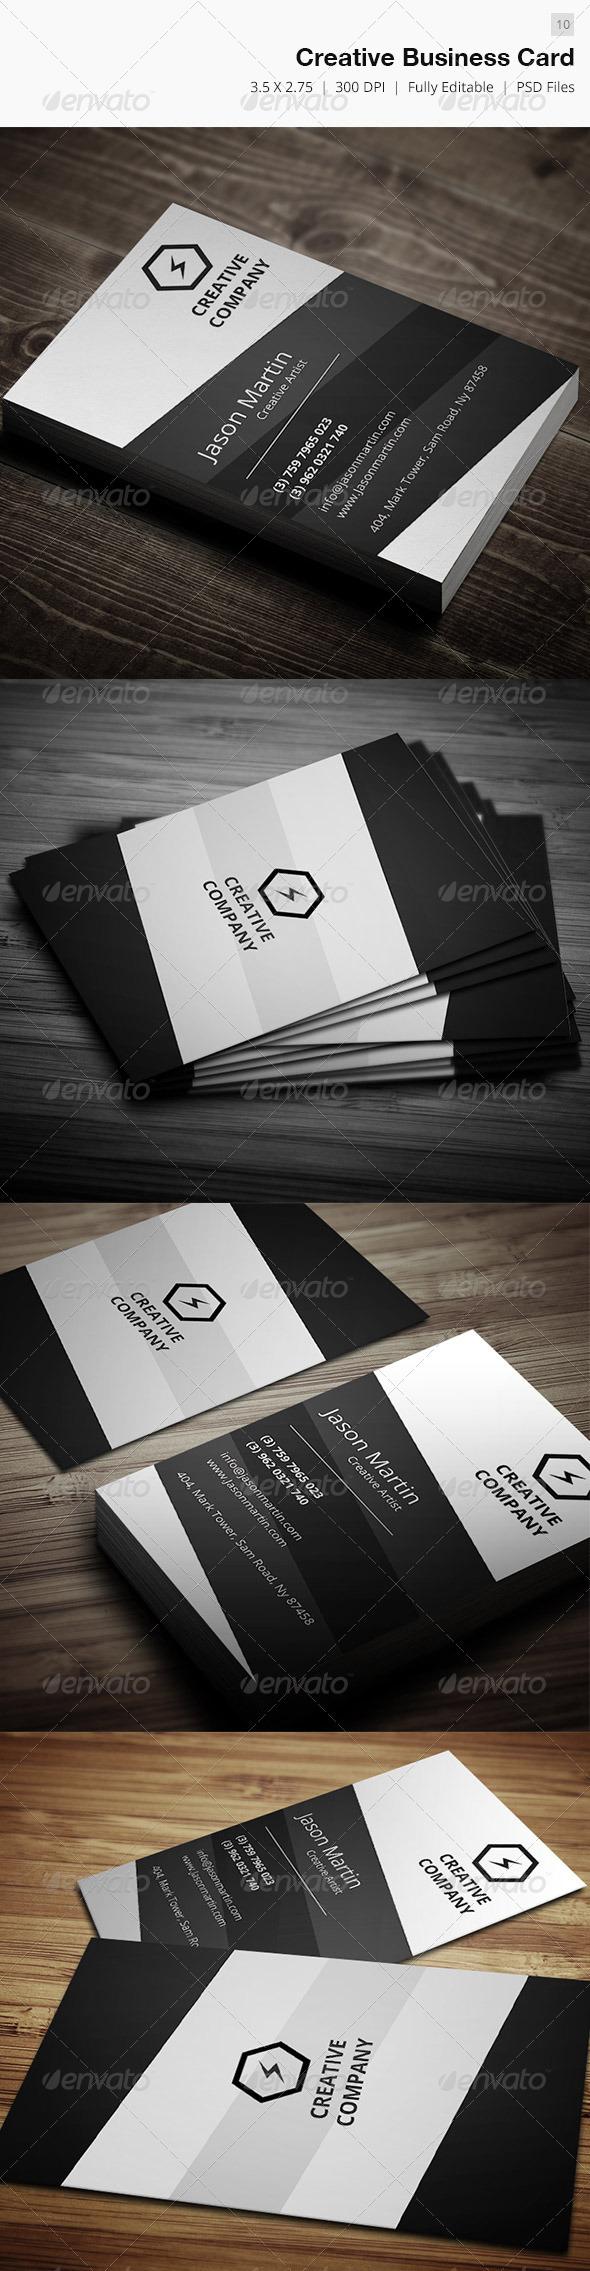 Creative Business Card - 10 - Creative Business Cards